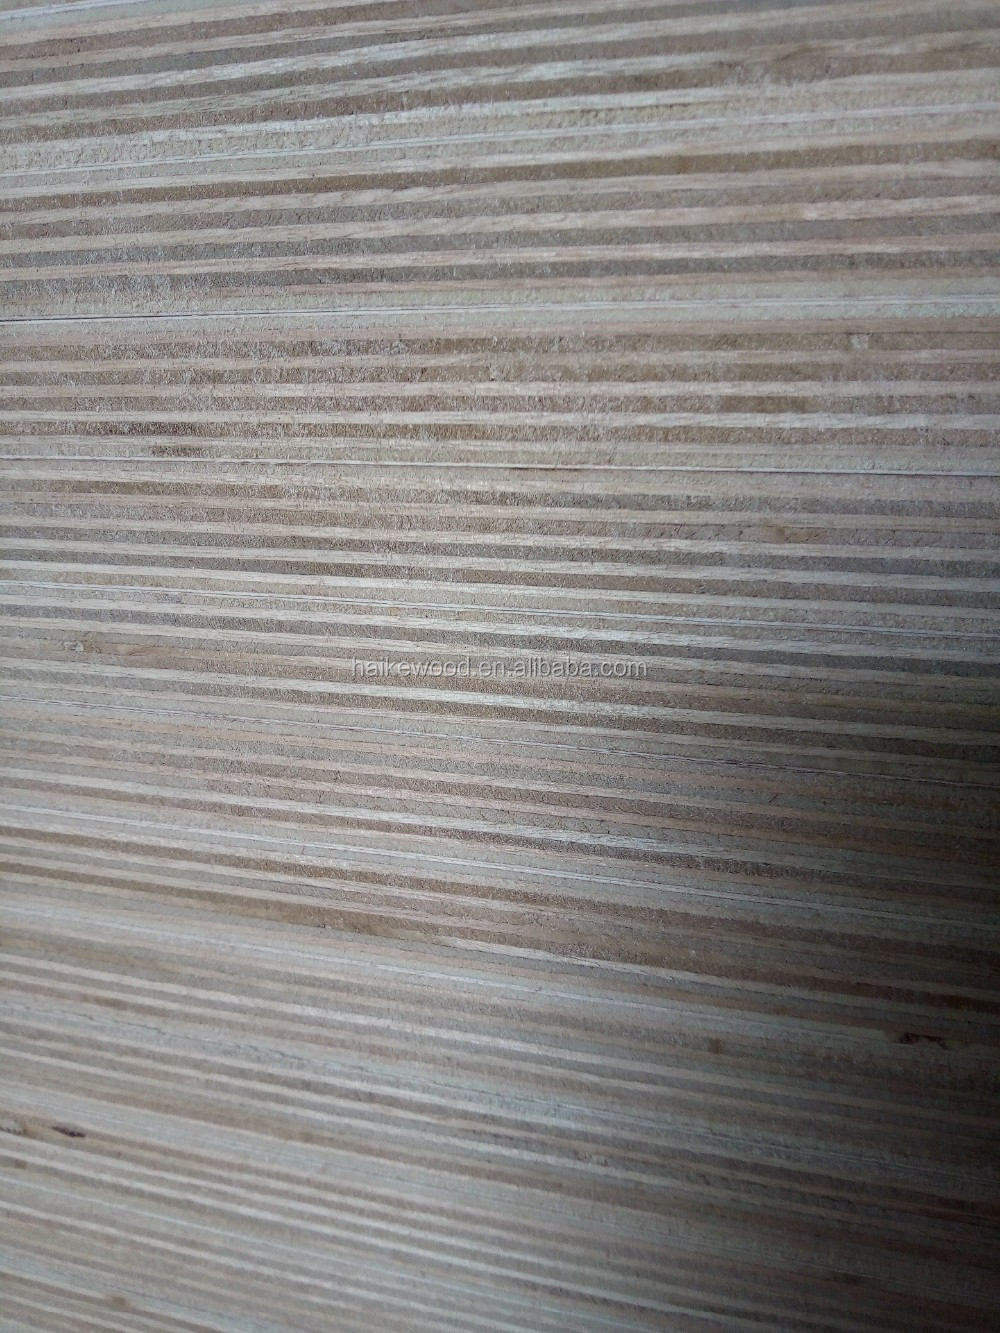 Cheap Price White Melamine Laminated Plywood Sheet 18mm